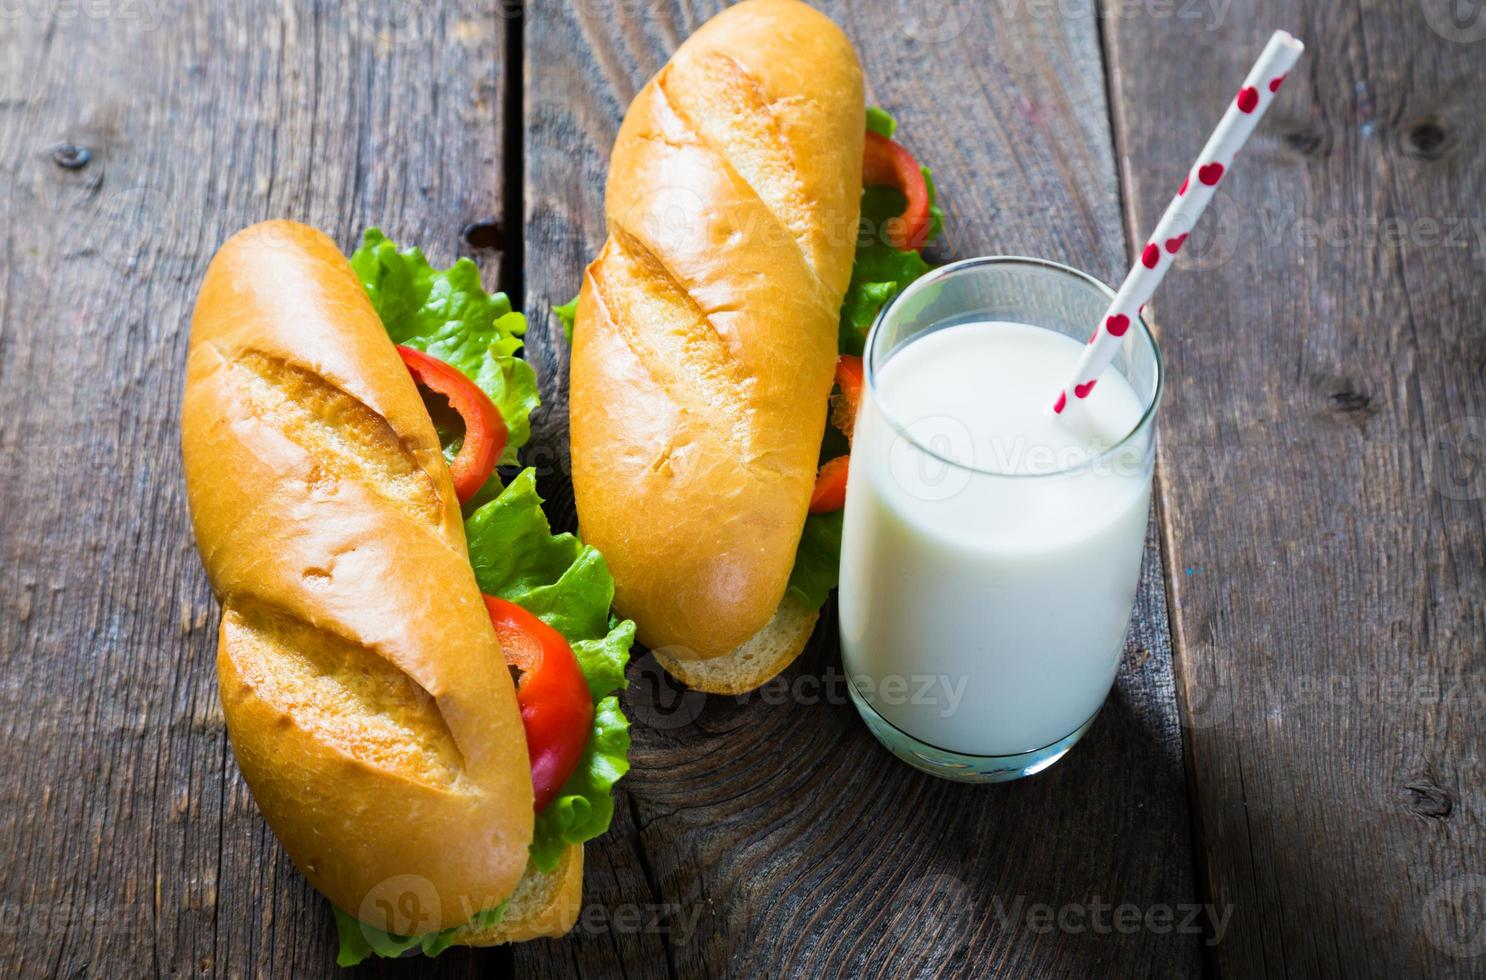 panini e latte foto